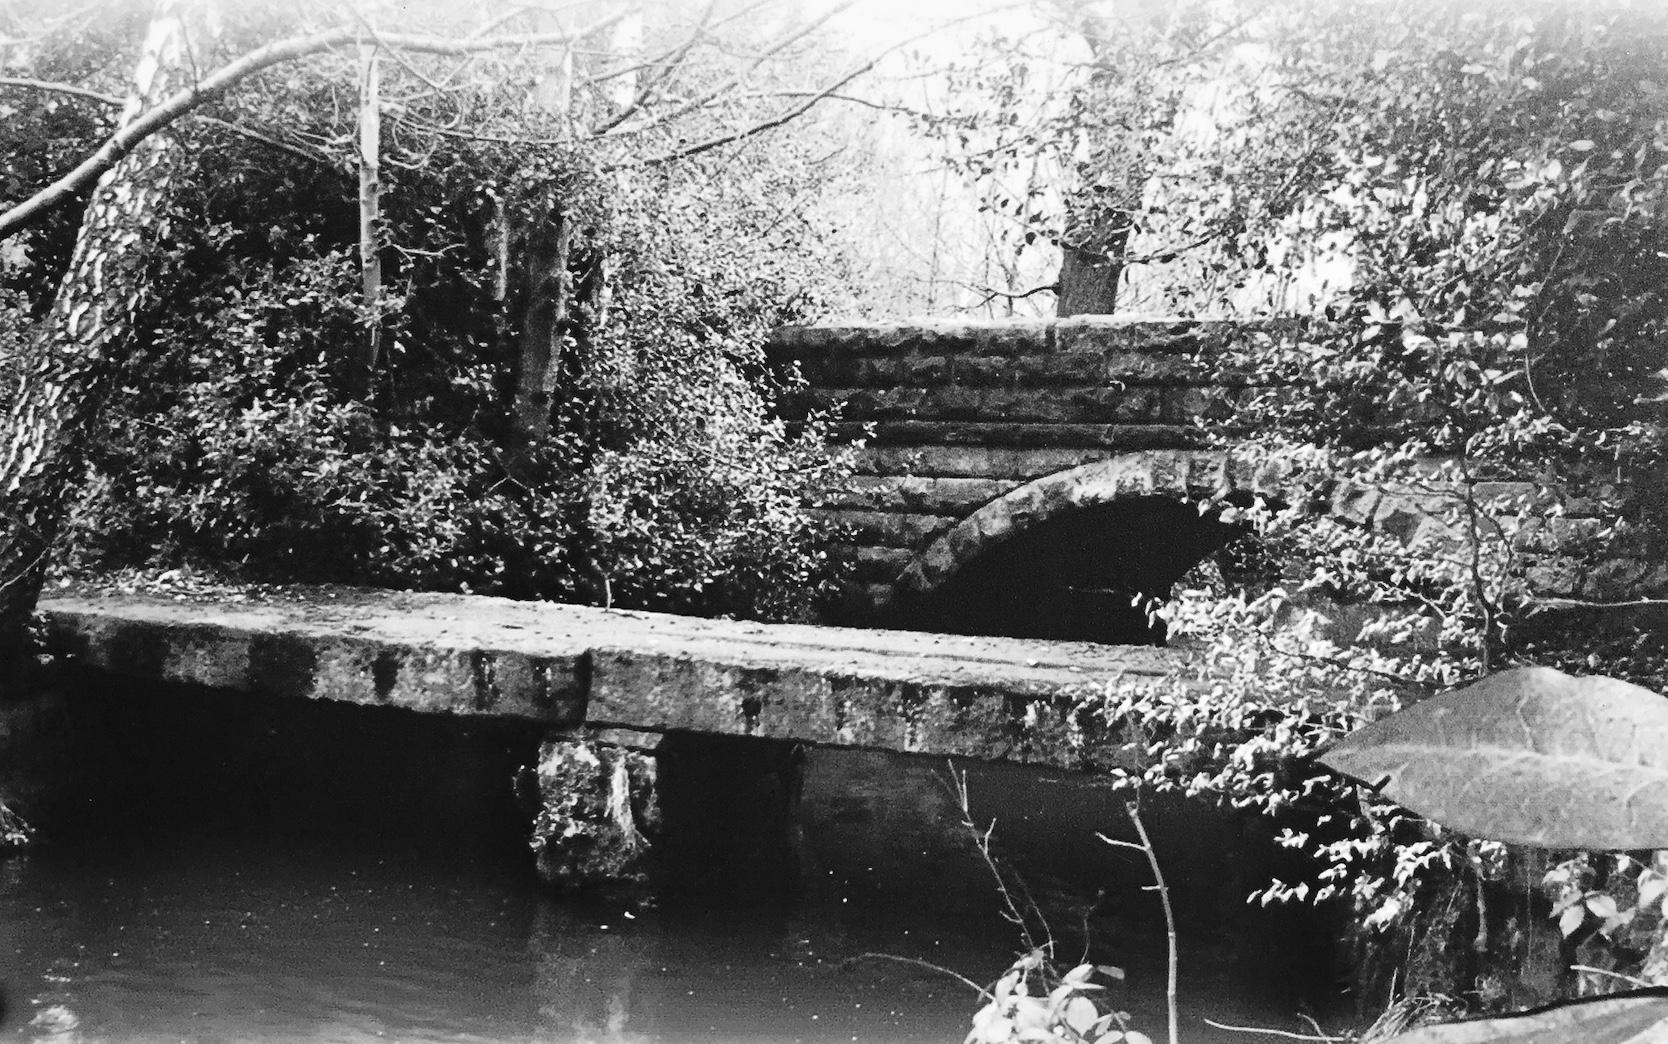 Clapper Bridge over Meanwood Beck, undated